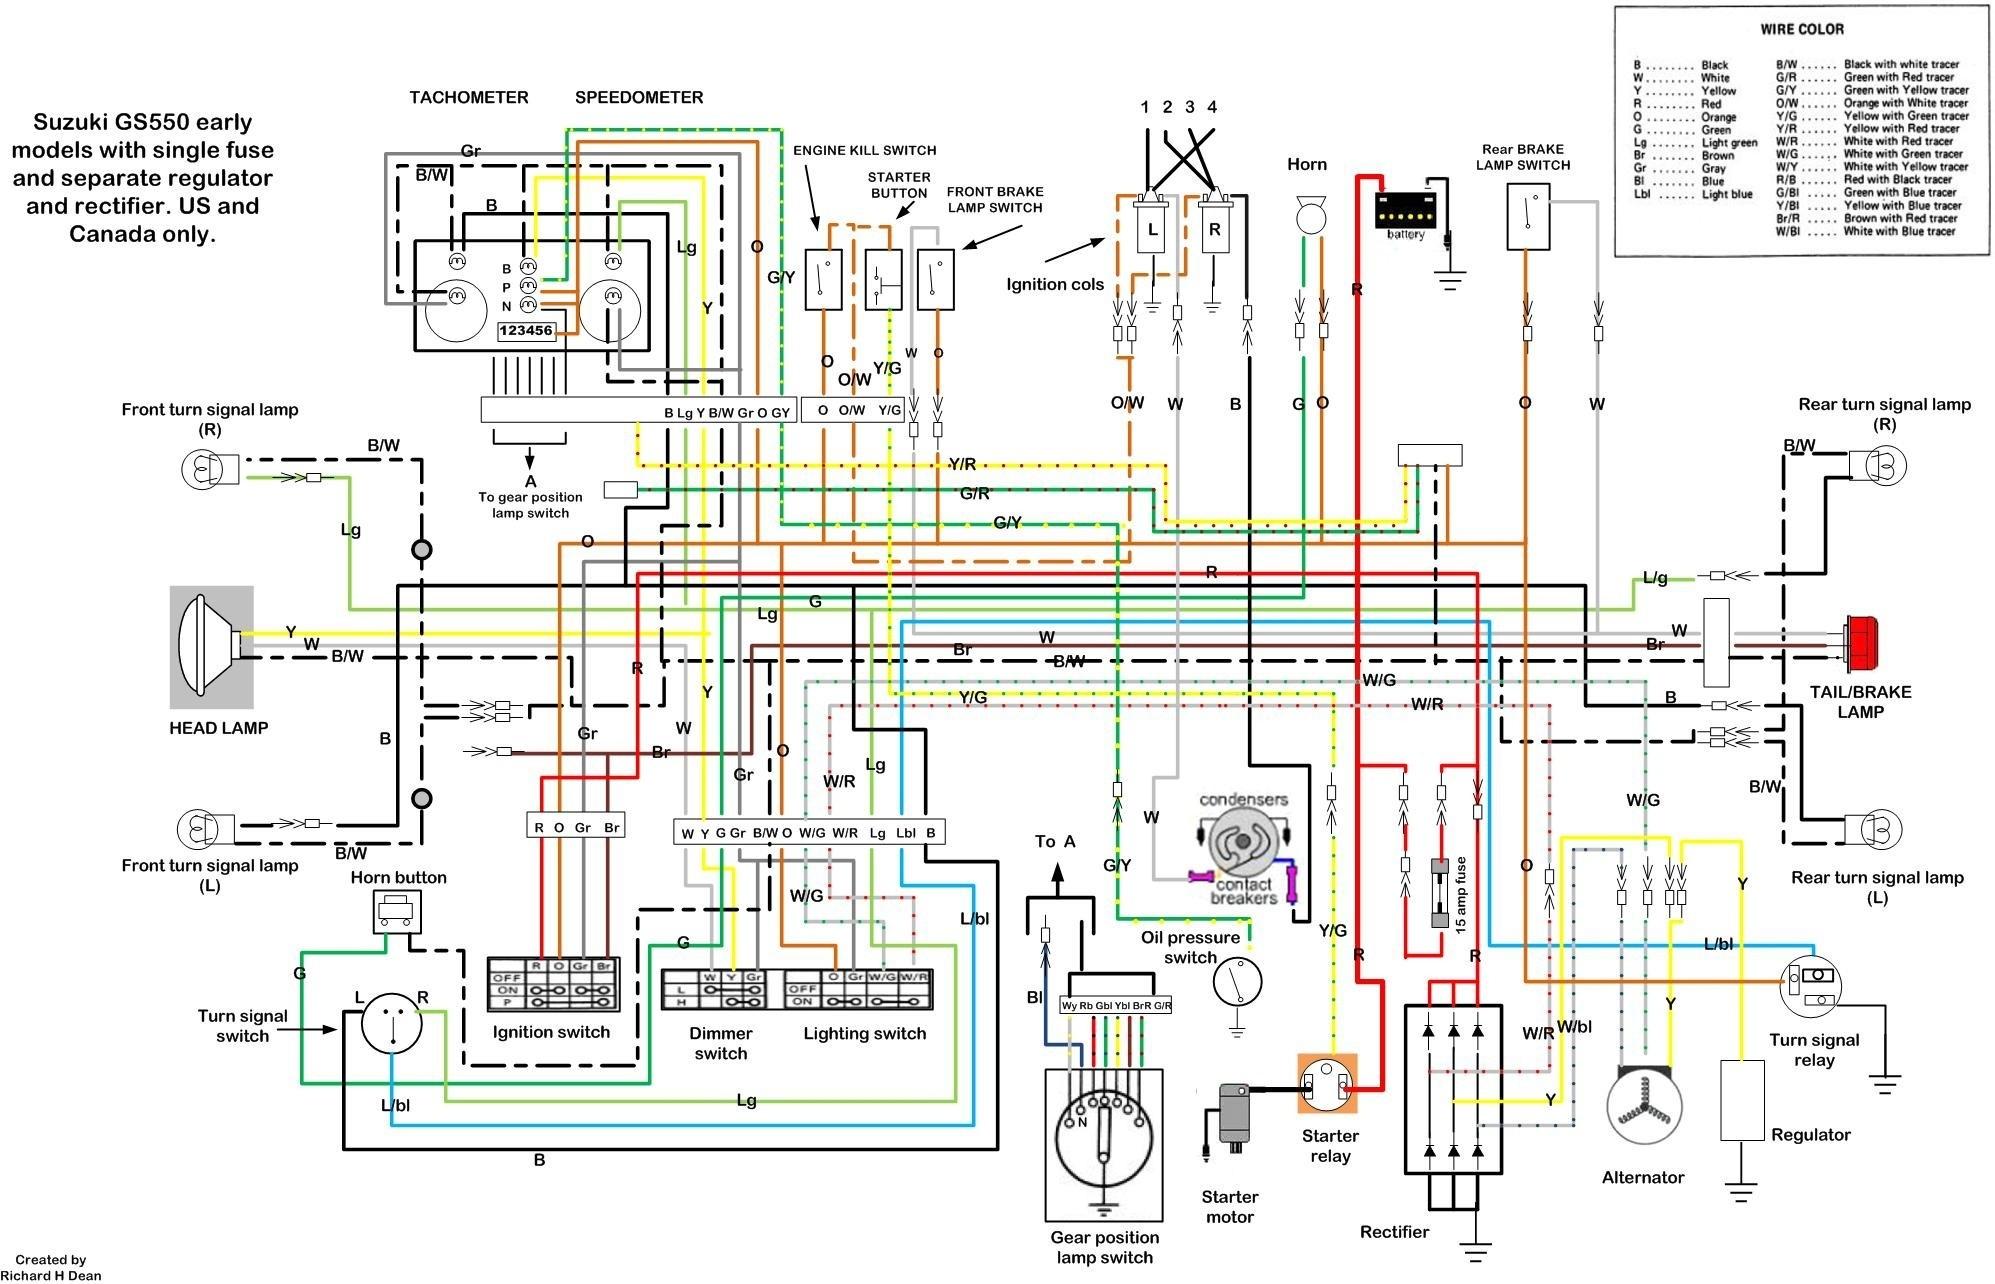 1981 toyota truck wiring diagram lg tv circuit pdf suzuki 750  for free